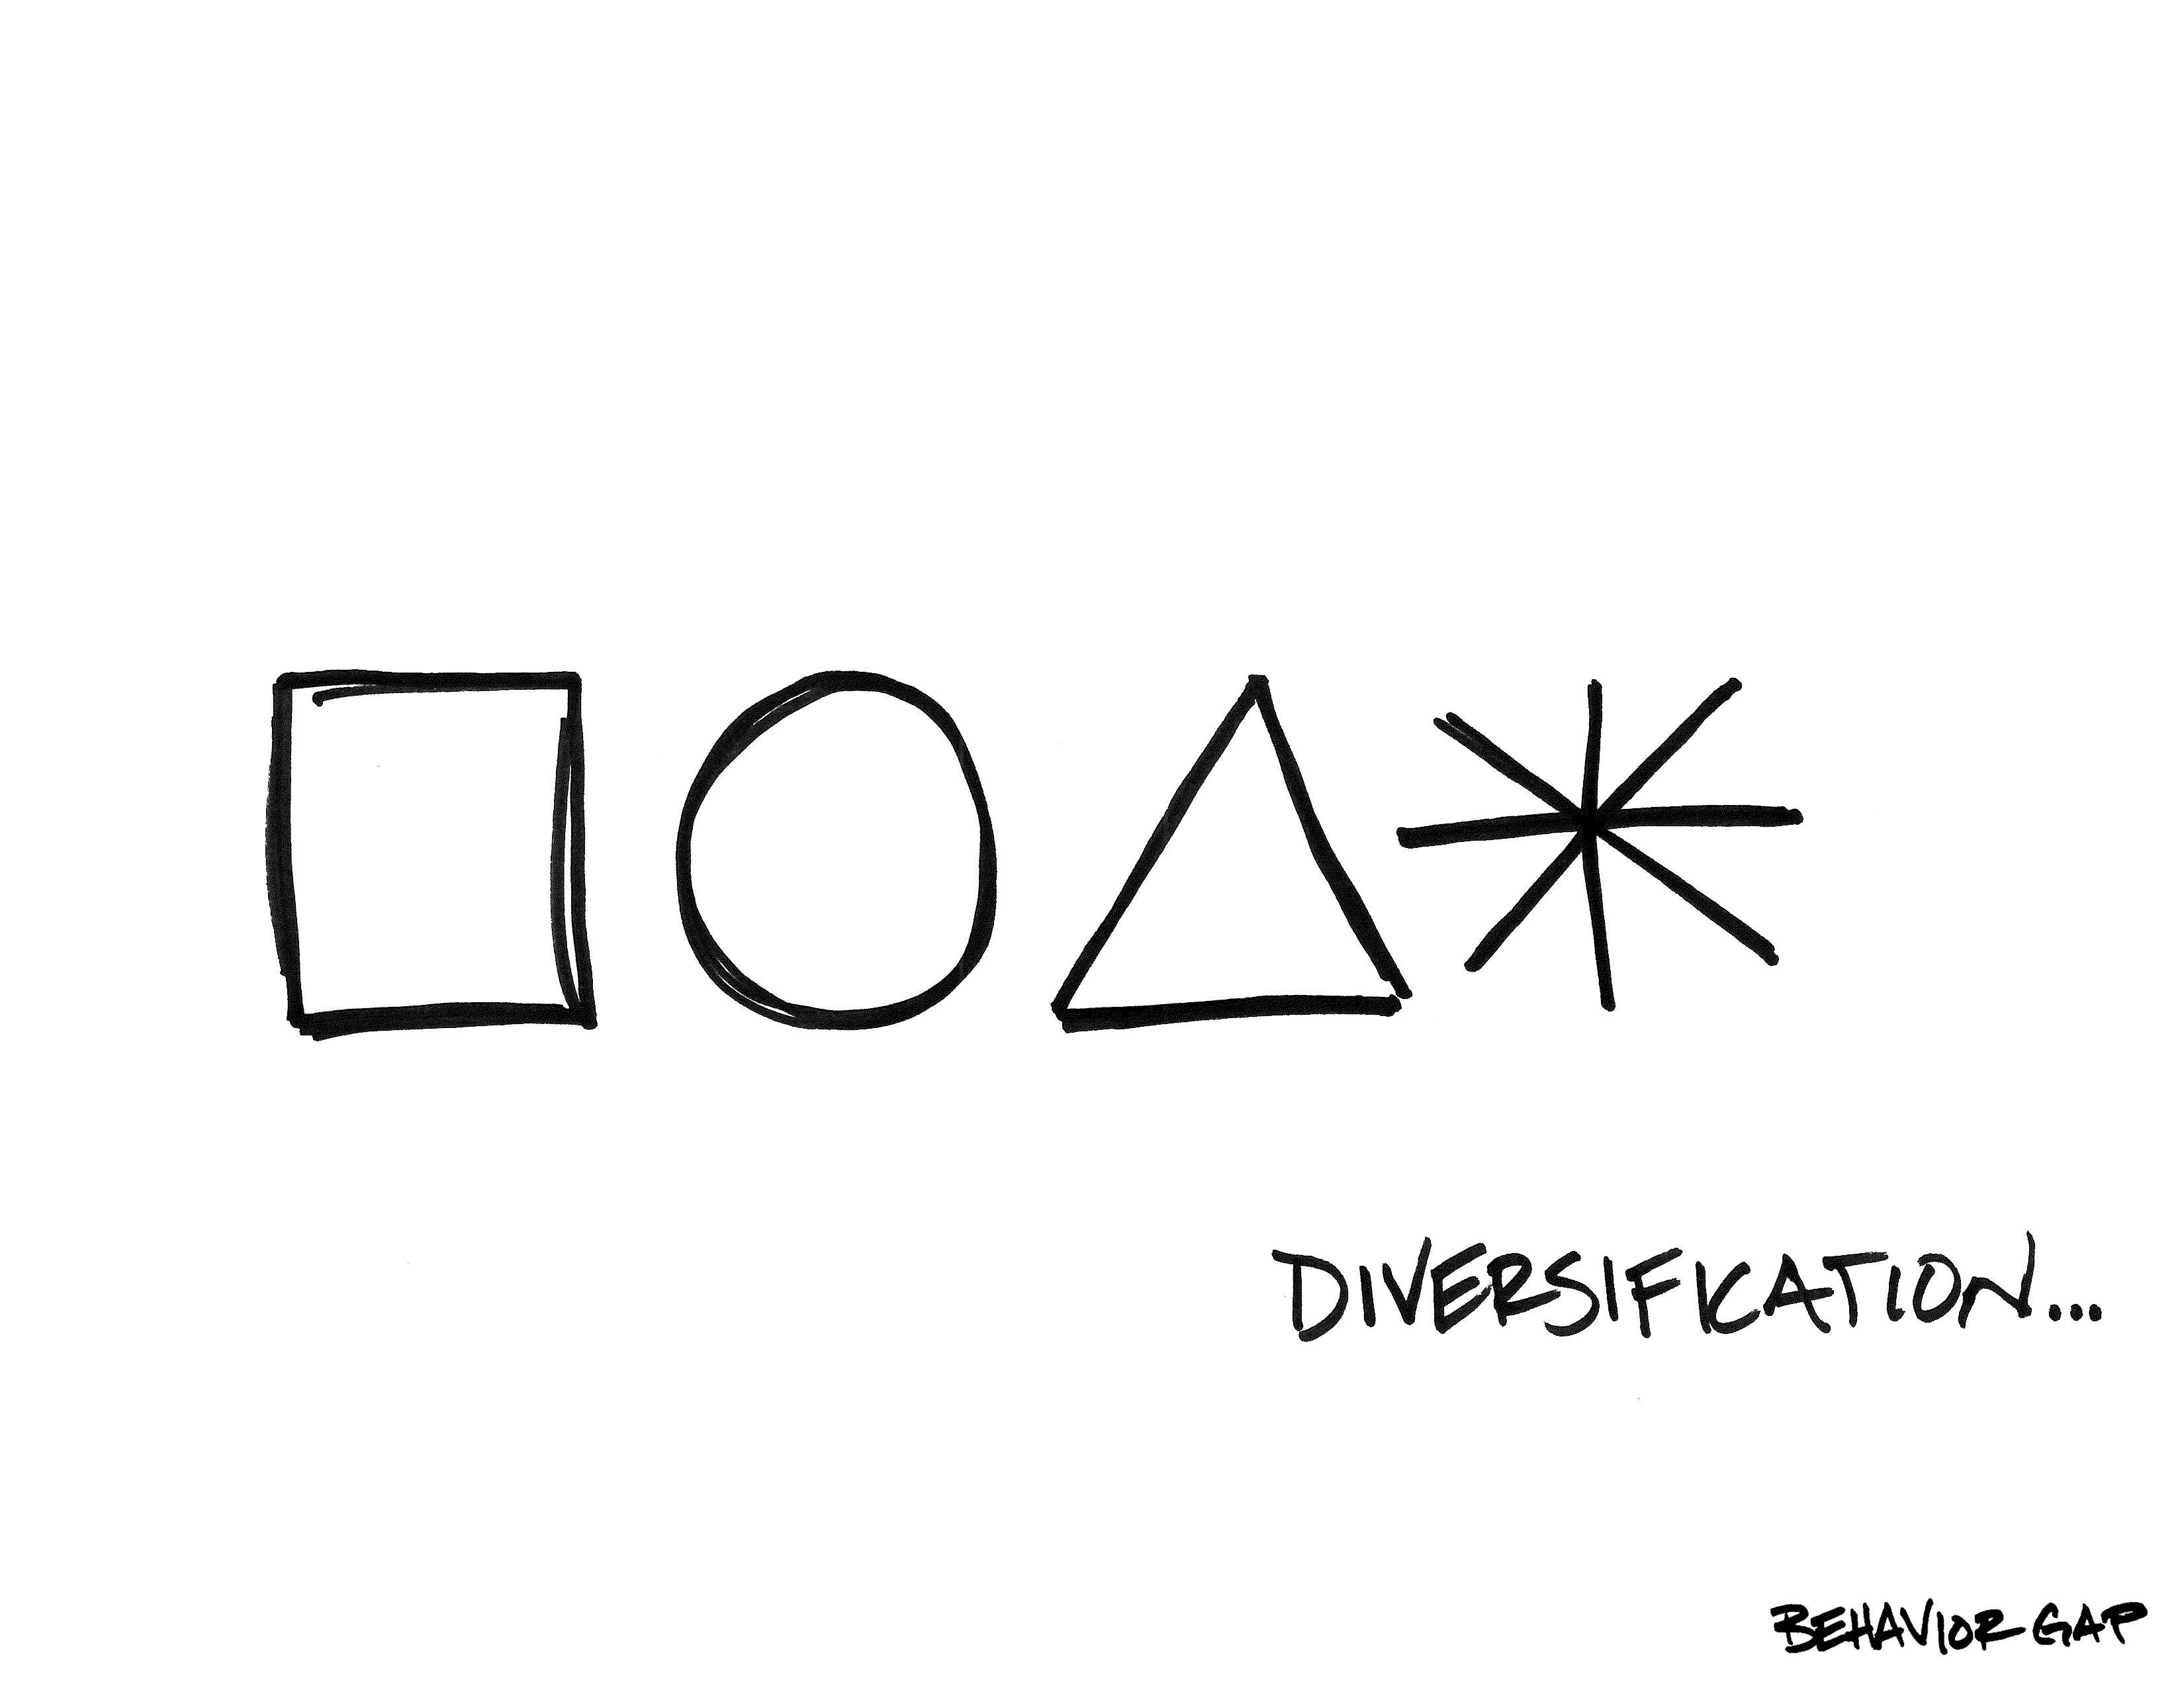 Carl Richards diversification